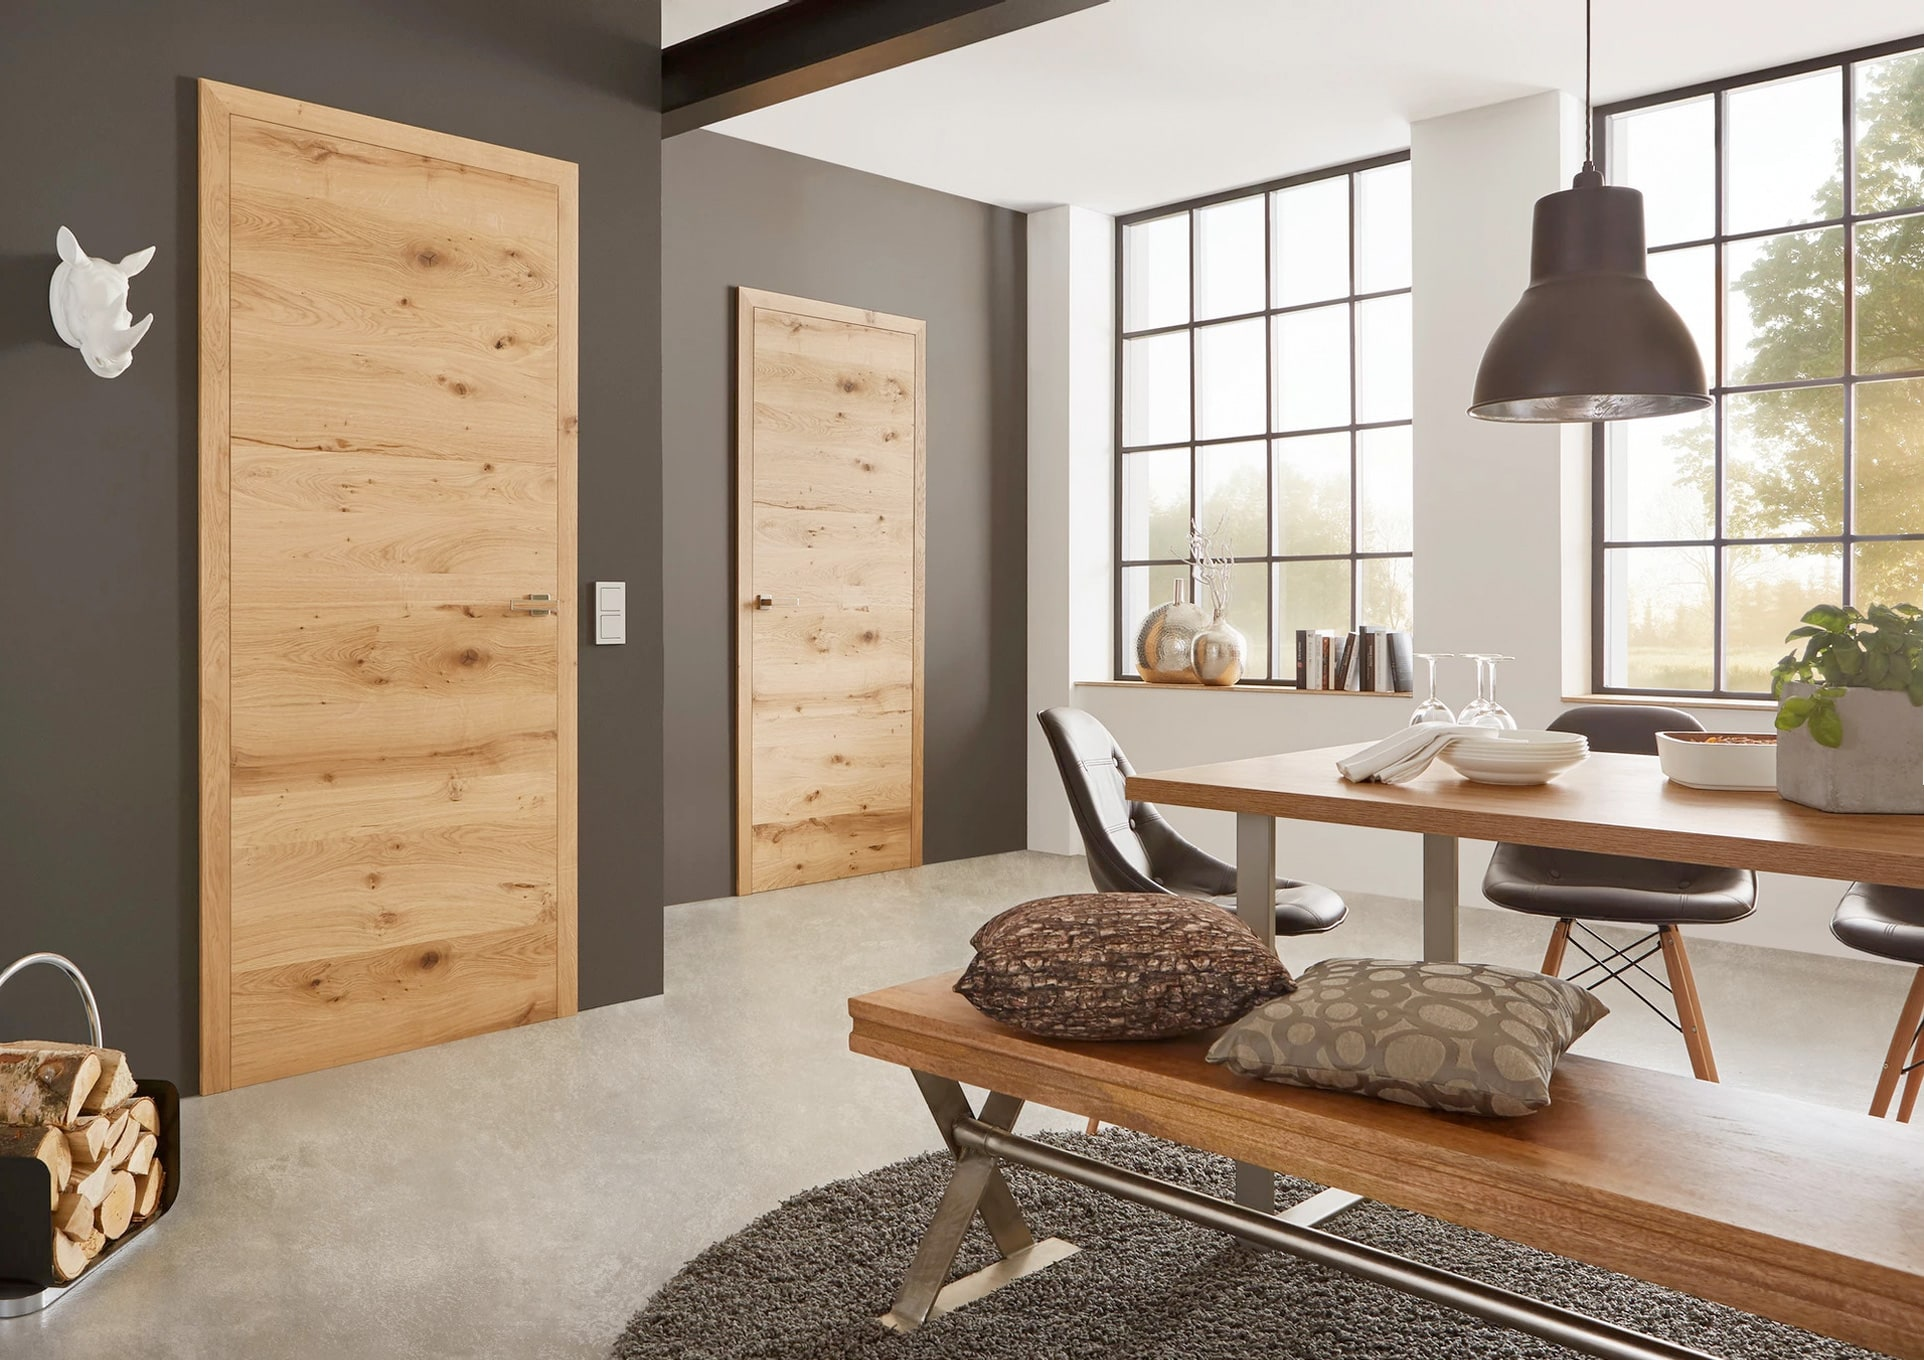 Modern Interior Doors With Real Wood Veneer Finish